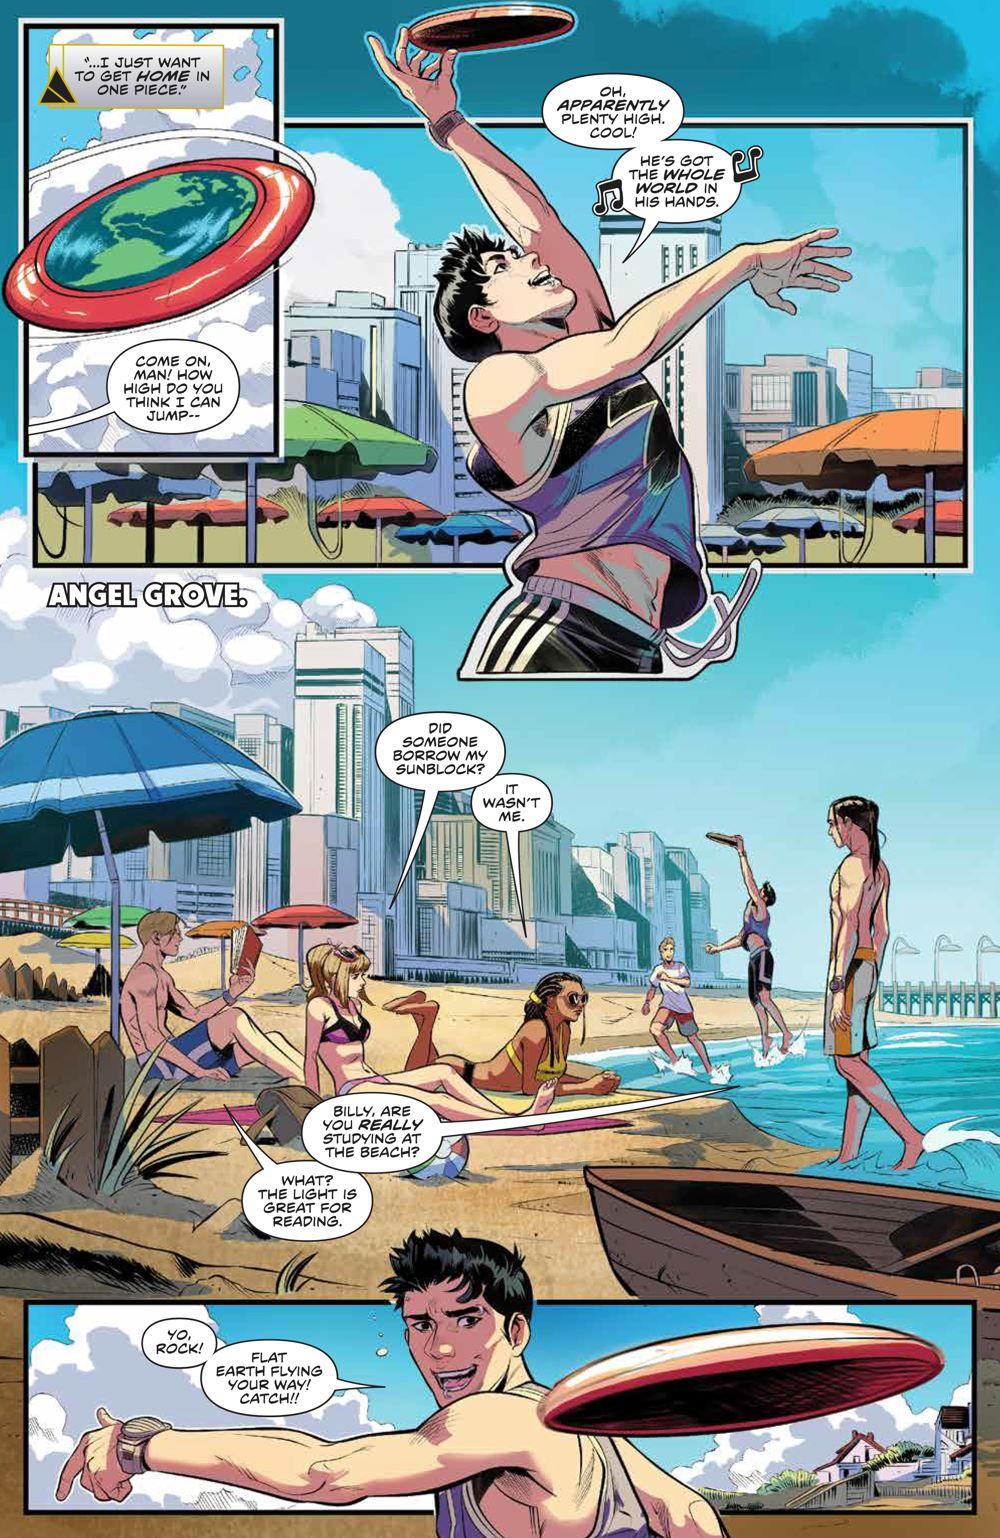 PowerRangers_v1_SC_PRESS_11 ComicList Previews: POWER RANGERS VOLUME 1 TP